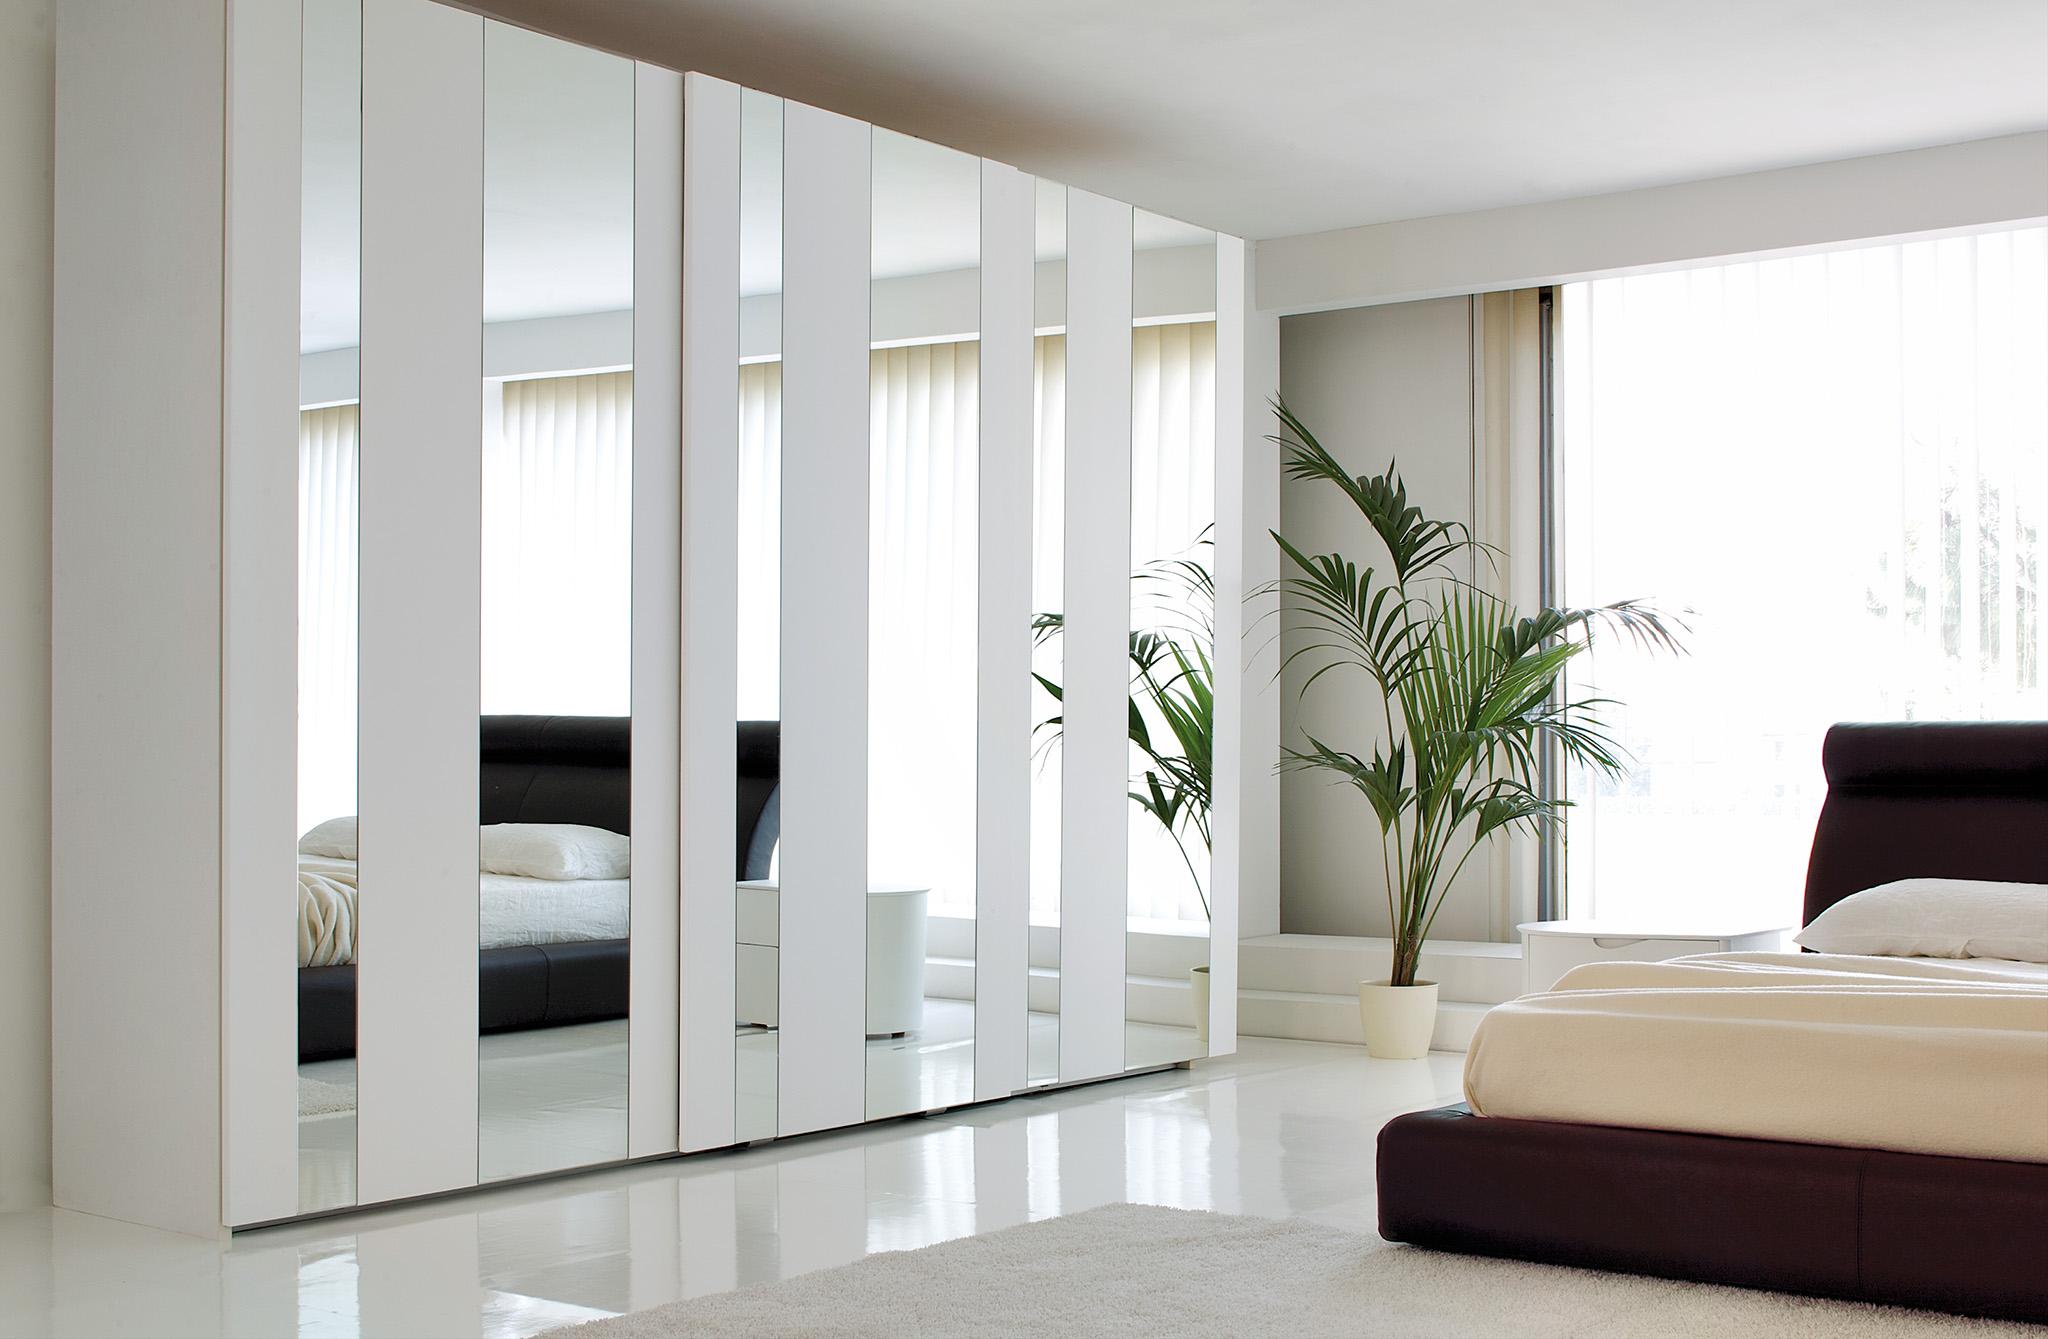 Mirrored Wardrobes, wardrobe doors, sliding wardrobe